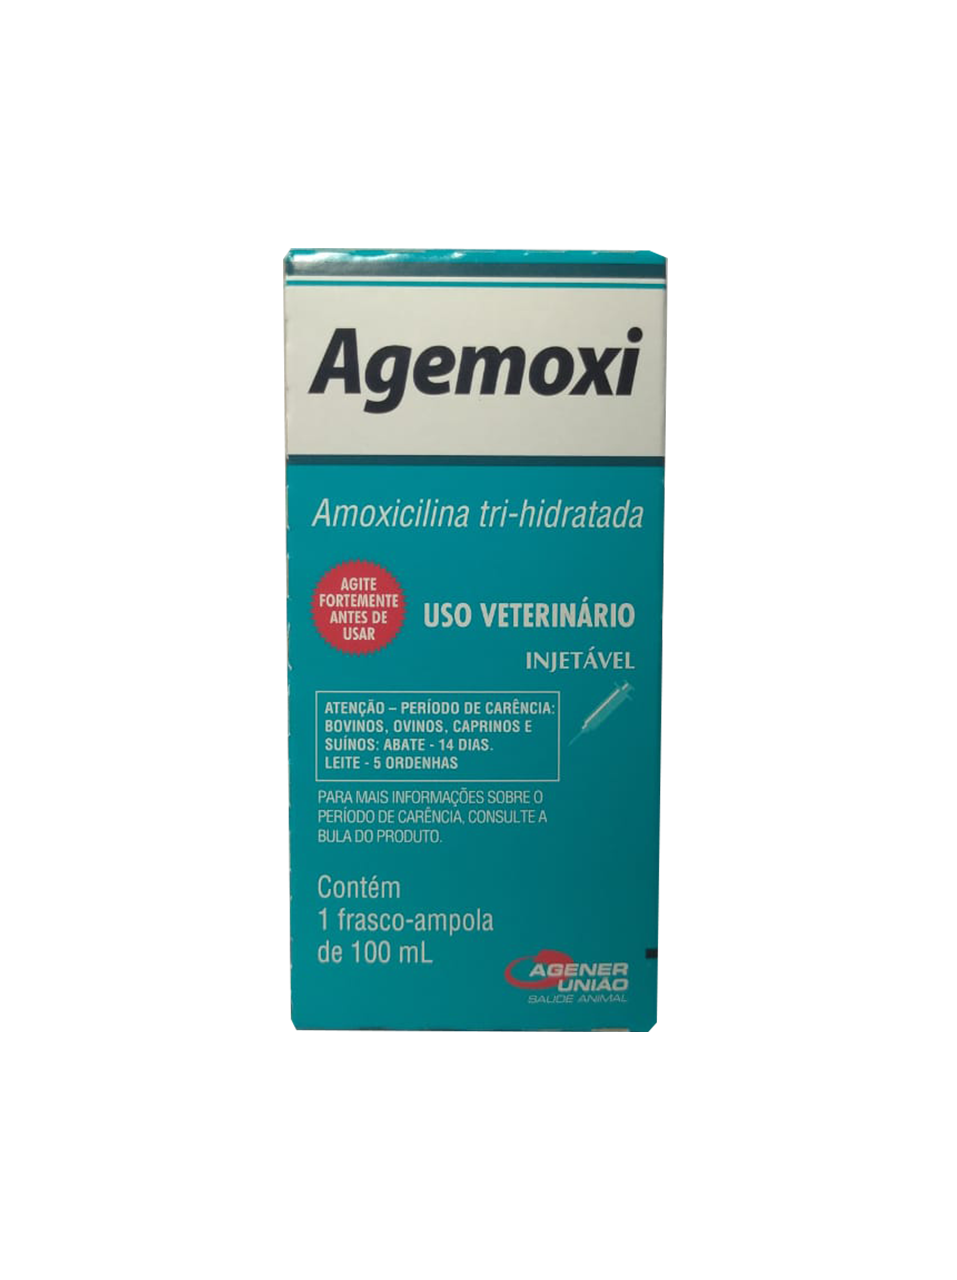 Agemoxi  Amoxicilina tri-hidratada - 100 ml  Agener